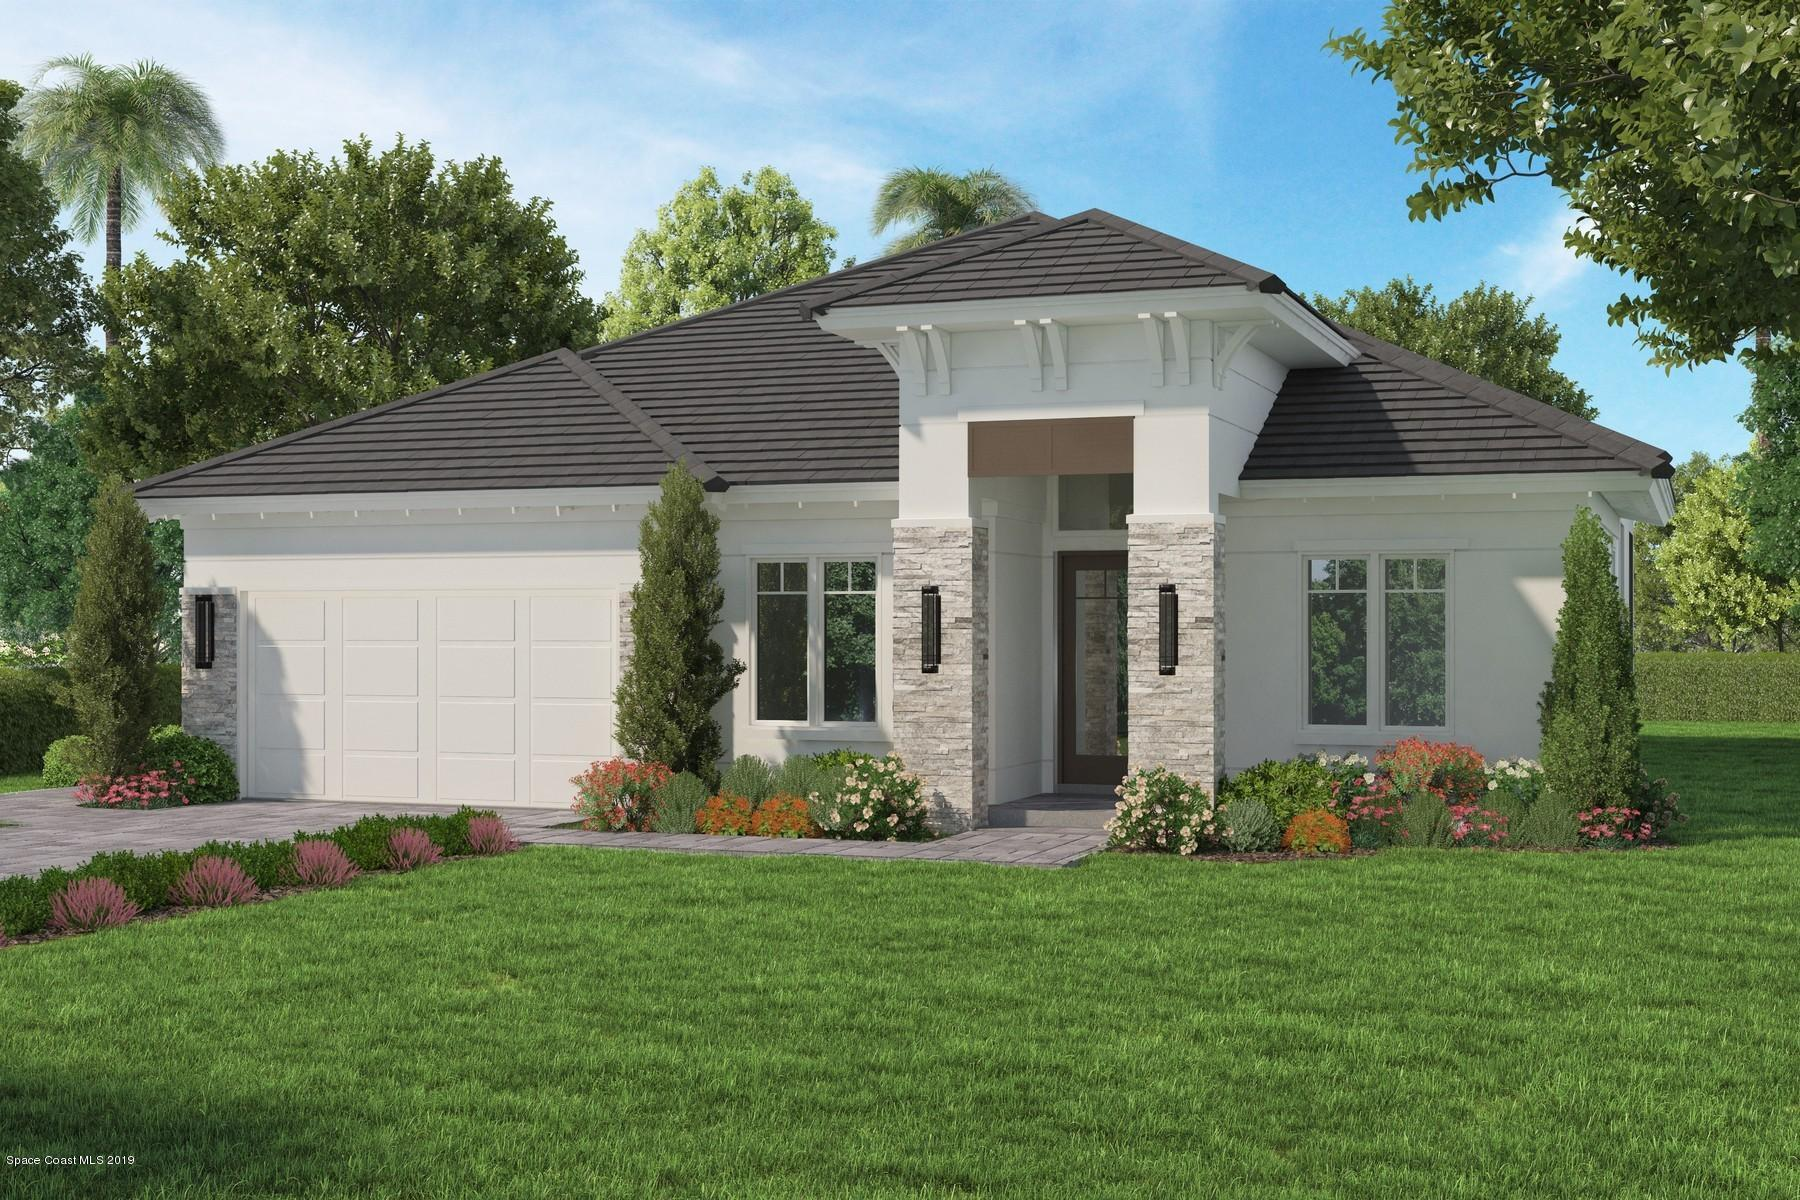 Single Family Homes για την Πώληση στο 9265 Orchid Cove Vero Beach, Φλοριντα 32963 Ηνωμένες Πολιτείες